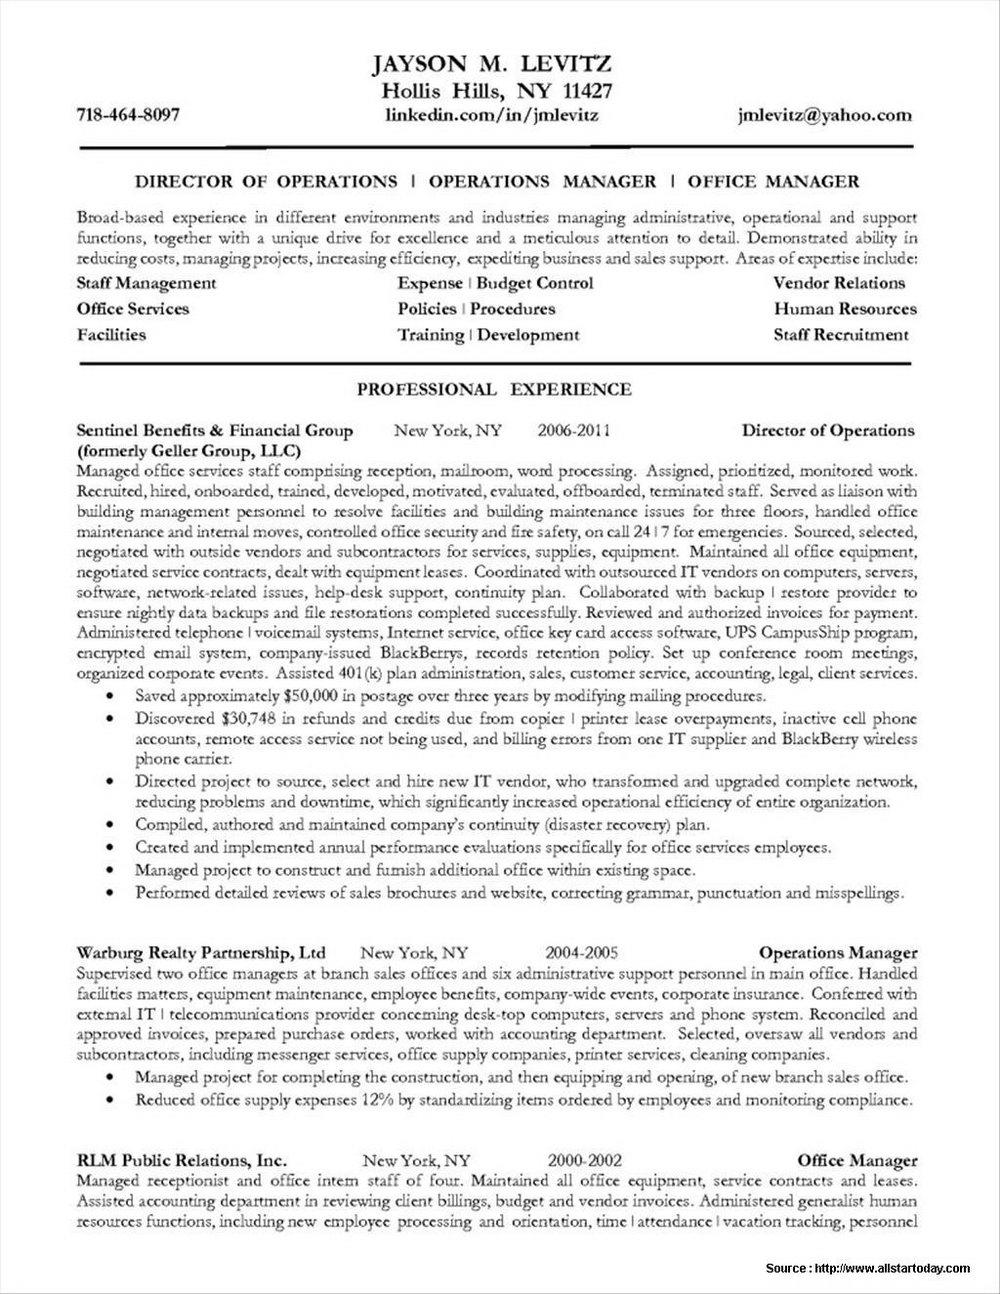 Resume Writing Services Memphis Tn